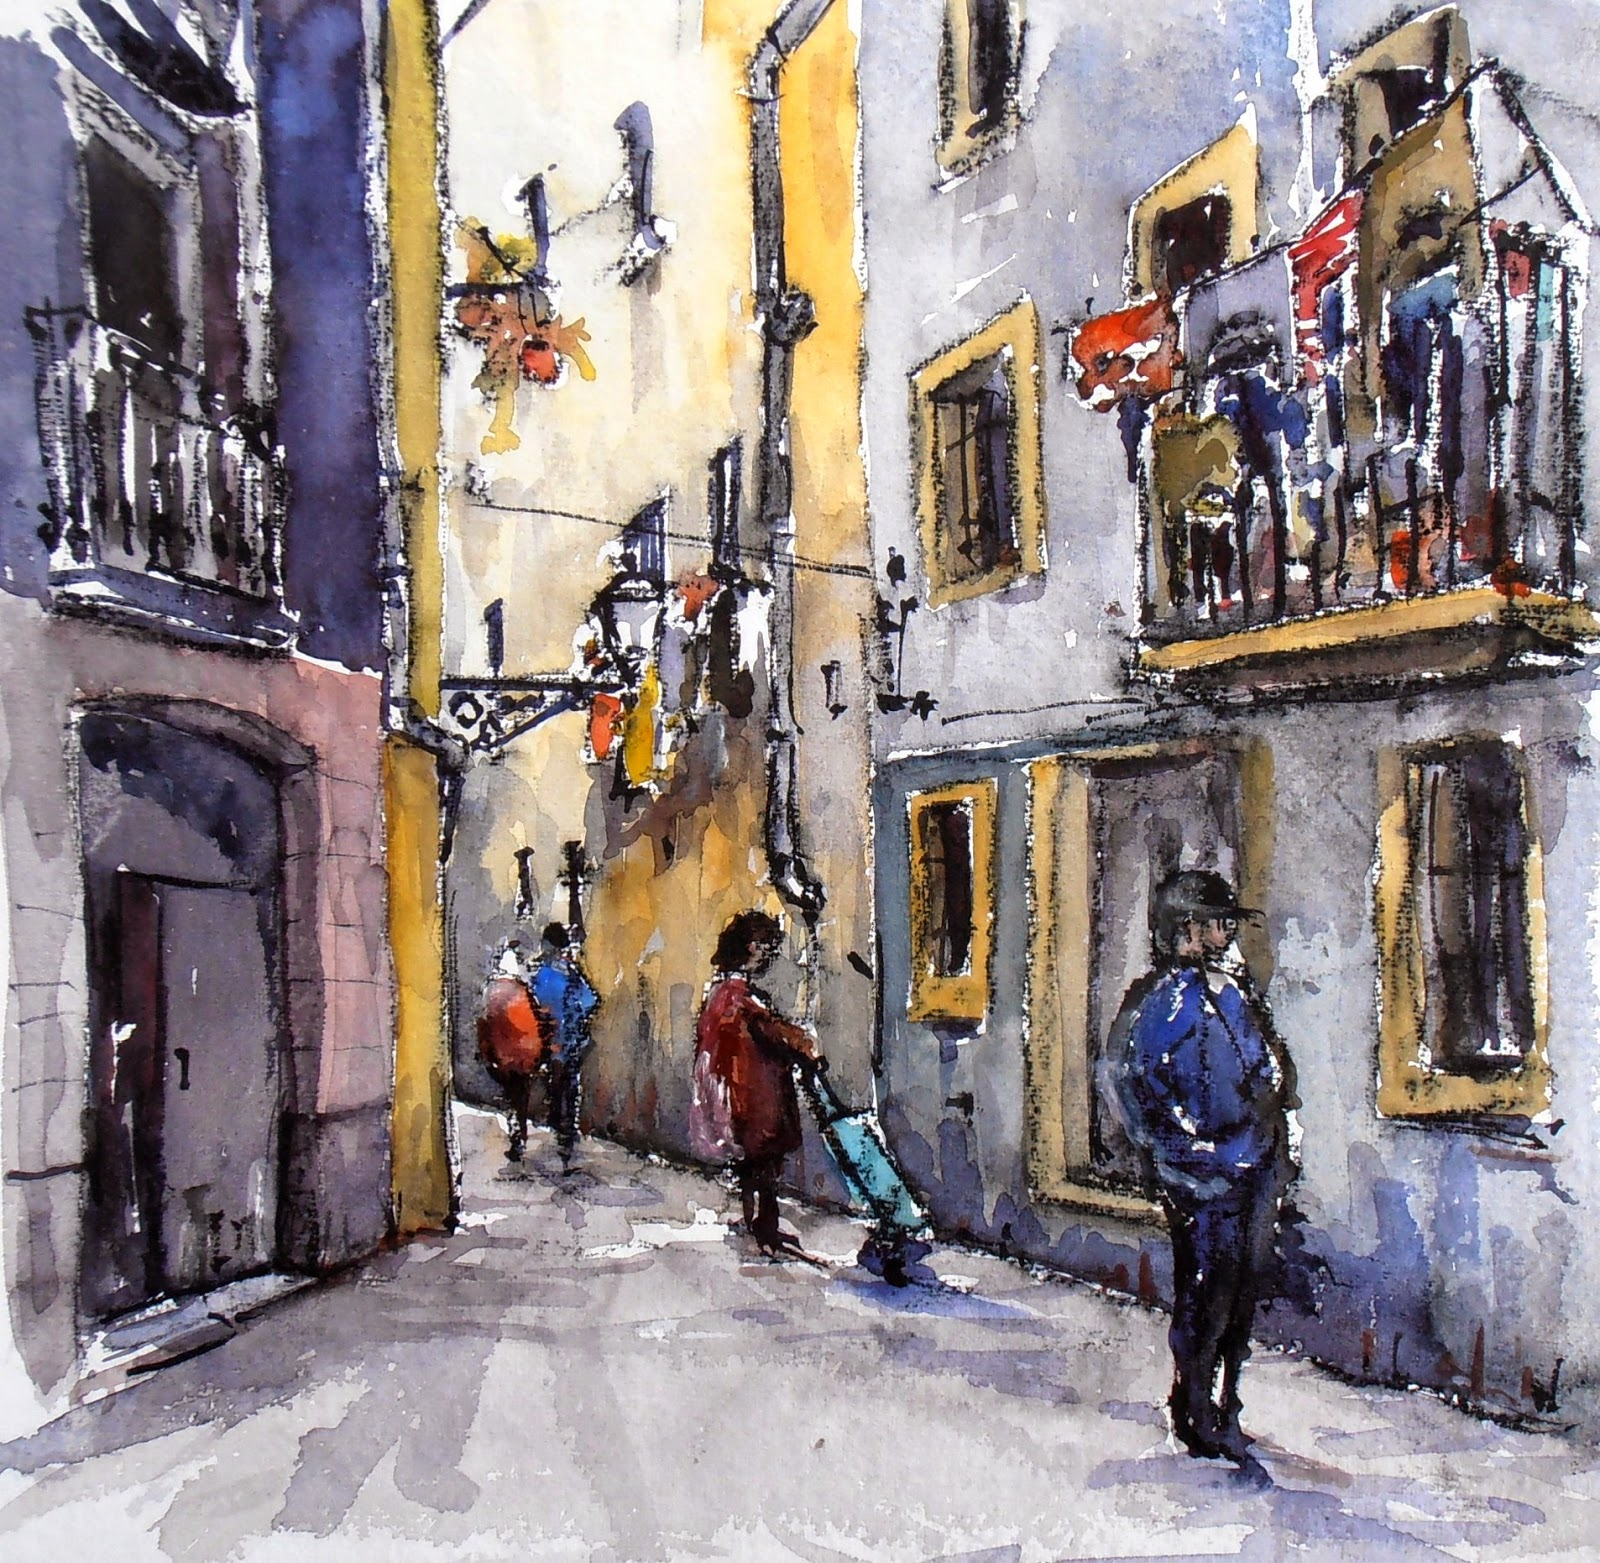 Joshemari larra aga acuarelas pasaje de las manufacturas - Calle montserrat barcelona ...